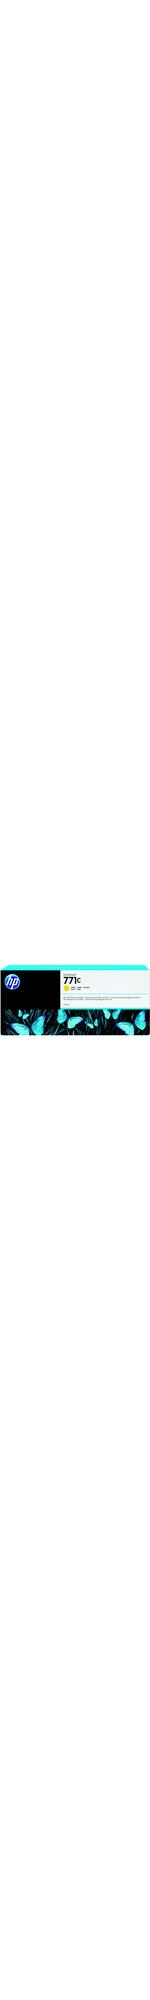 HP 771C Yellow Ink Cartridge x3 Pack